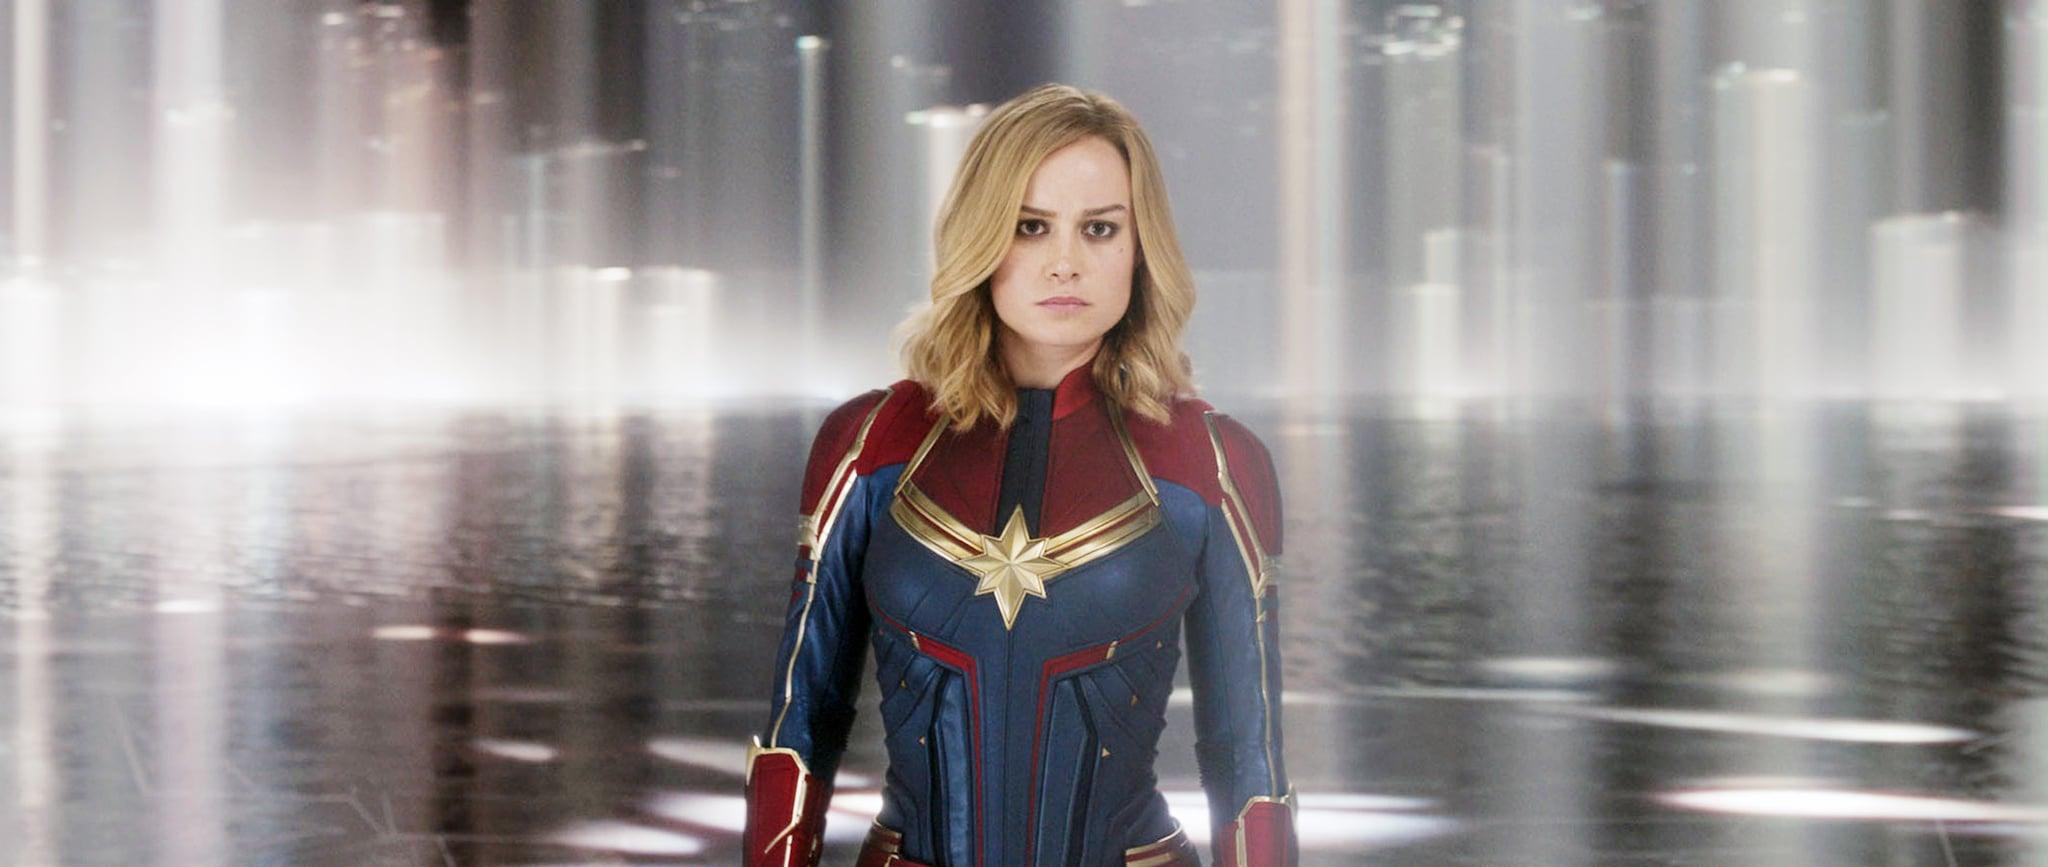 Ảnh nữ chính Captain Marvel